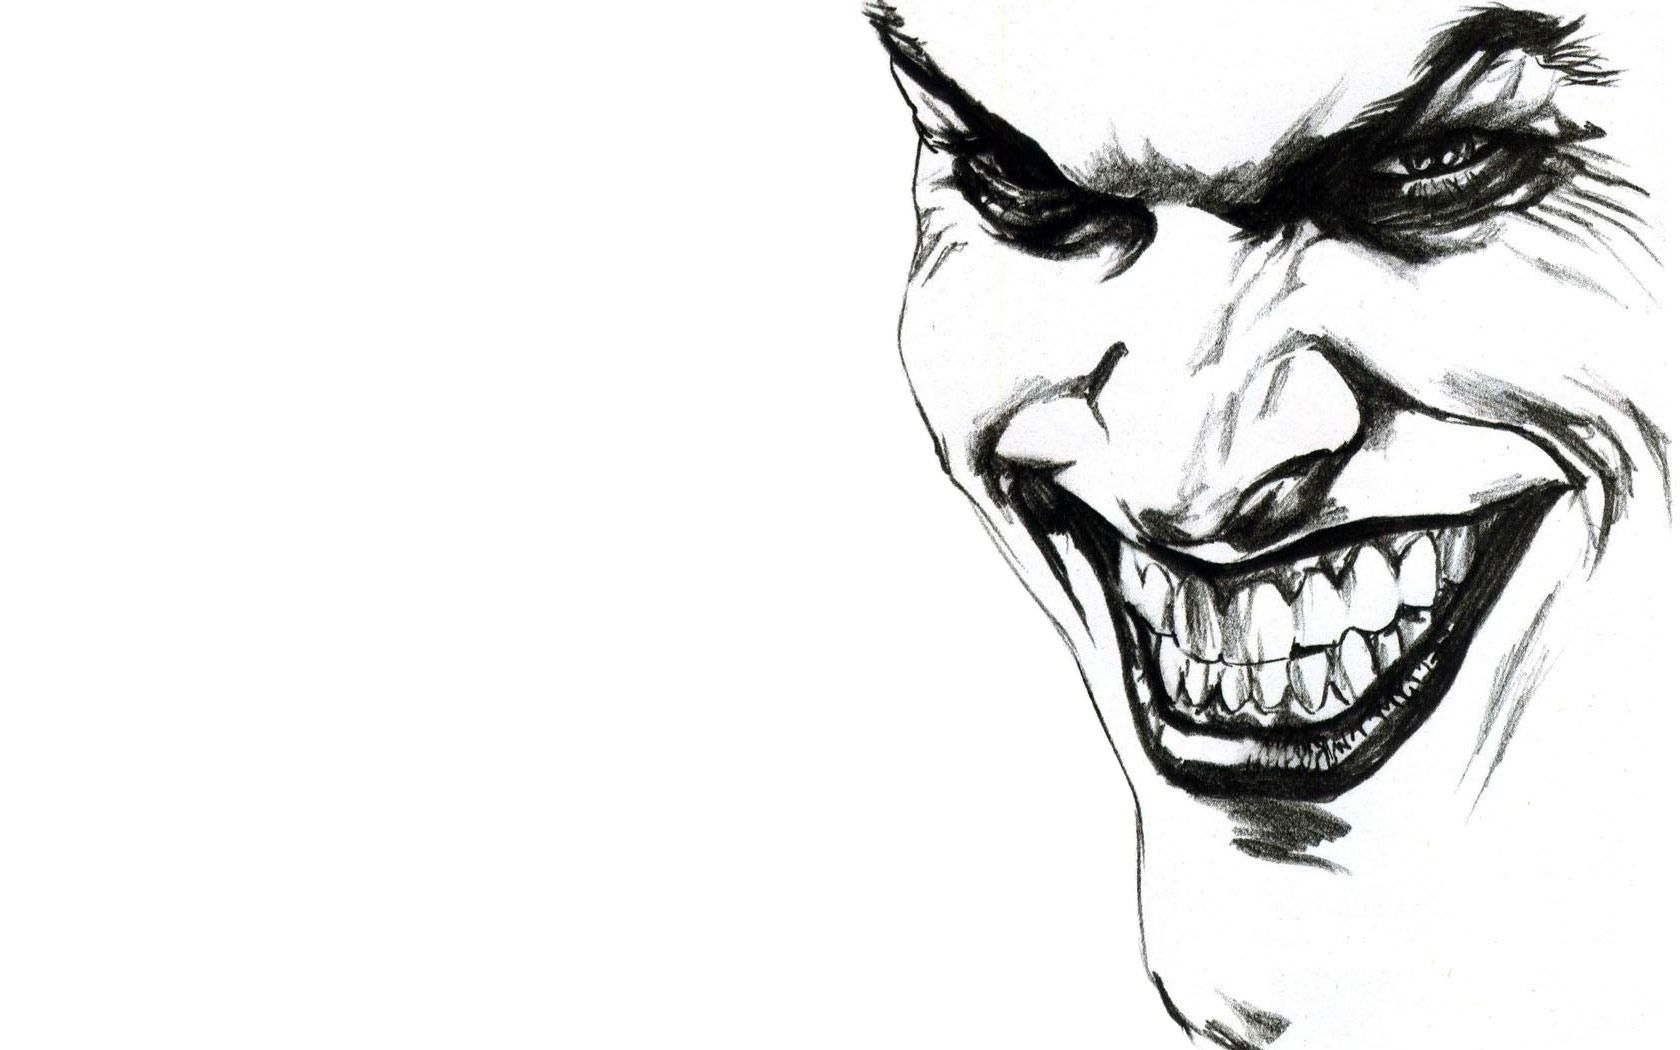 Astonishing joker sketch hd wallpaper